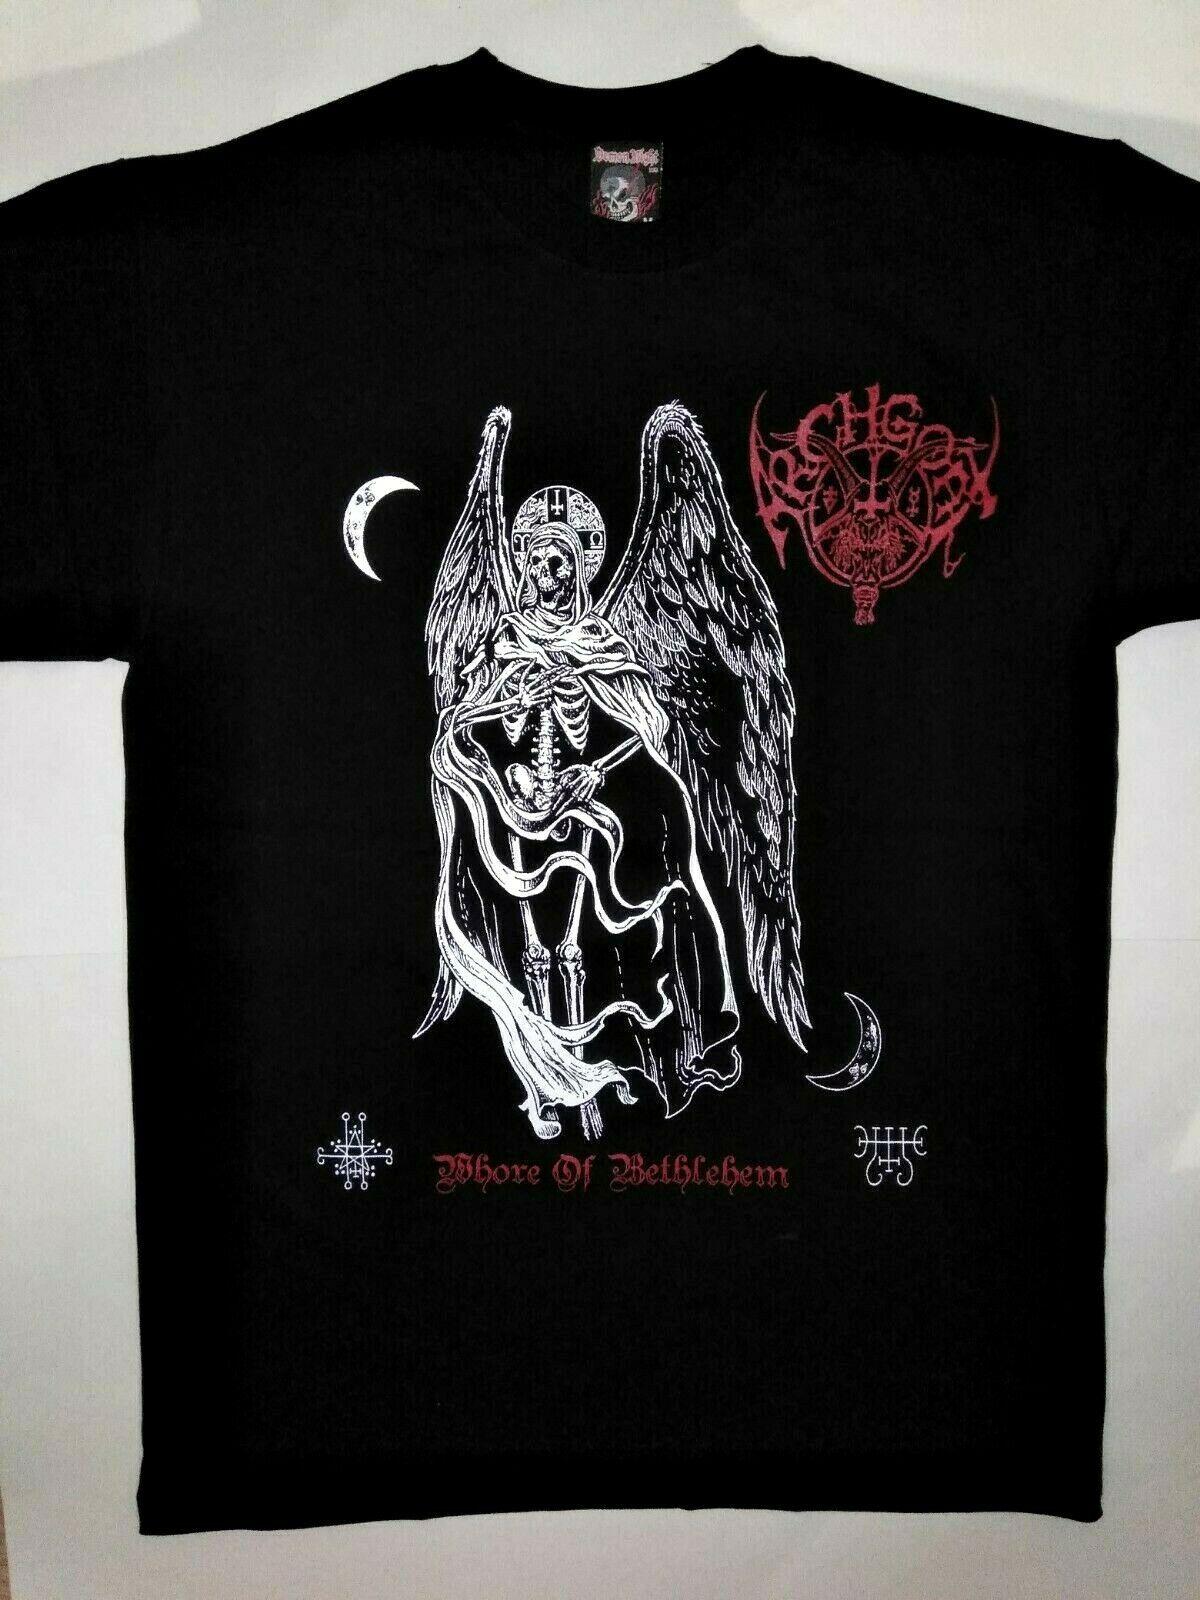 Archgoat T-Shirt Blasphemy Black Witchery Satanic Warmaster Whore Bethlehem